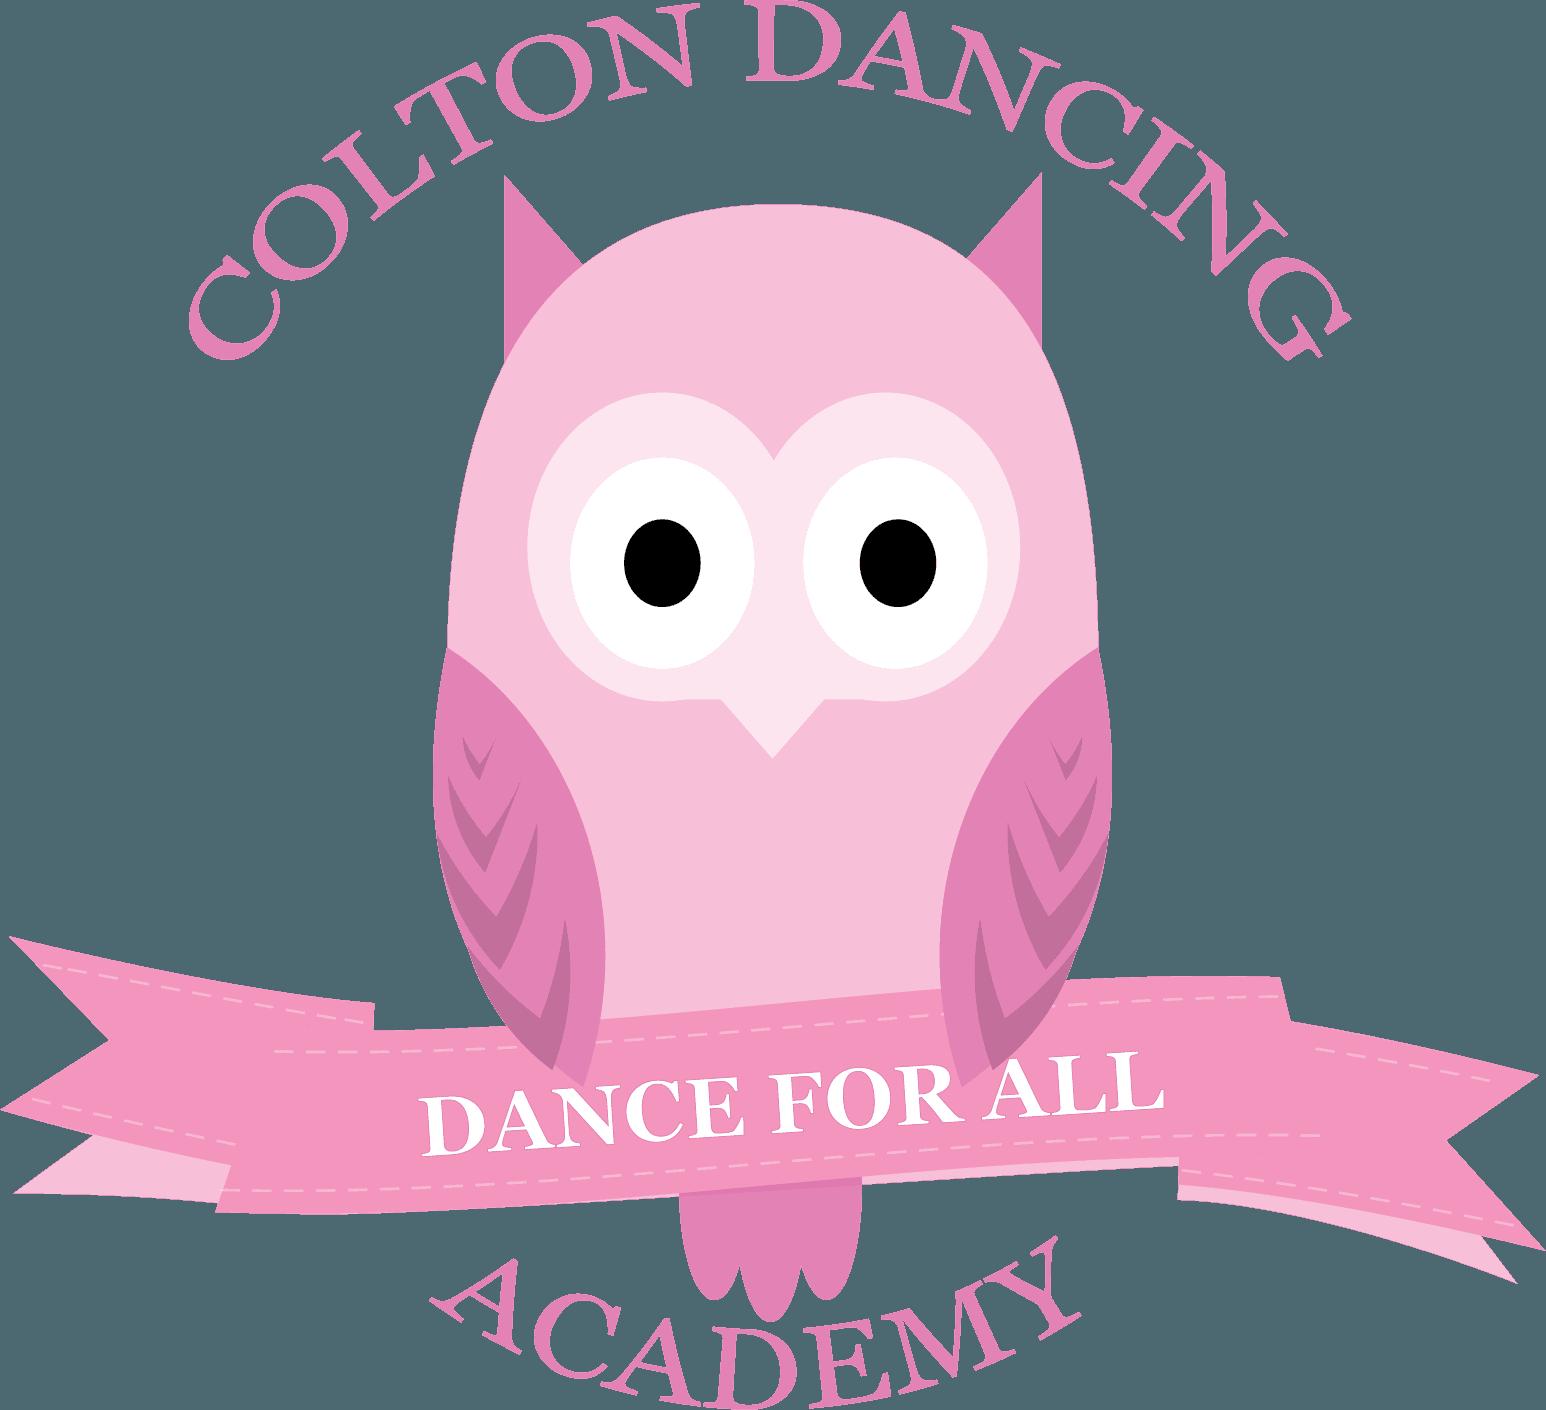 Colton Dancing Academy